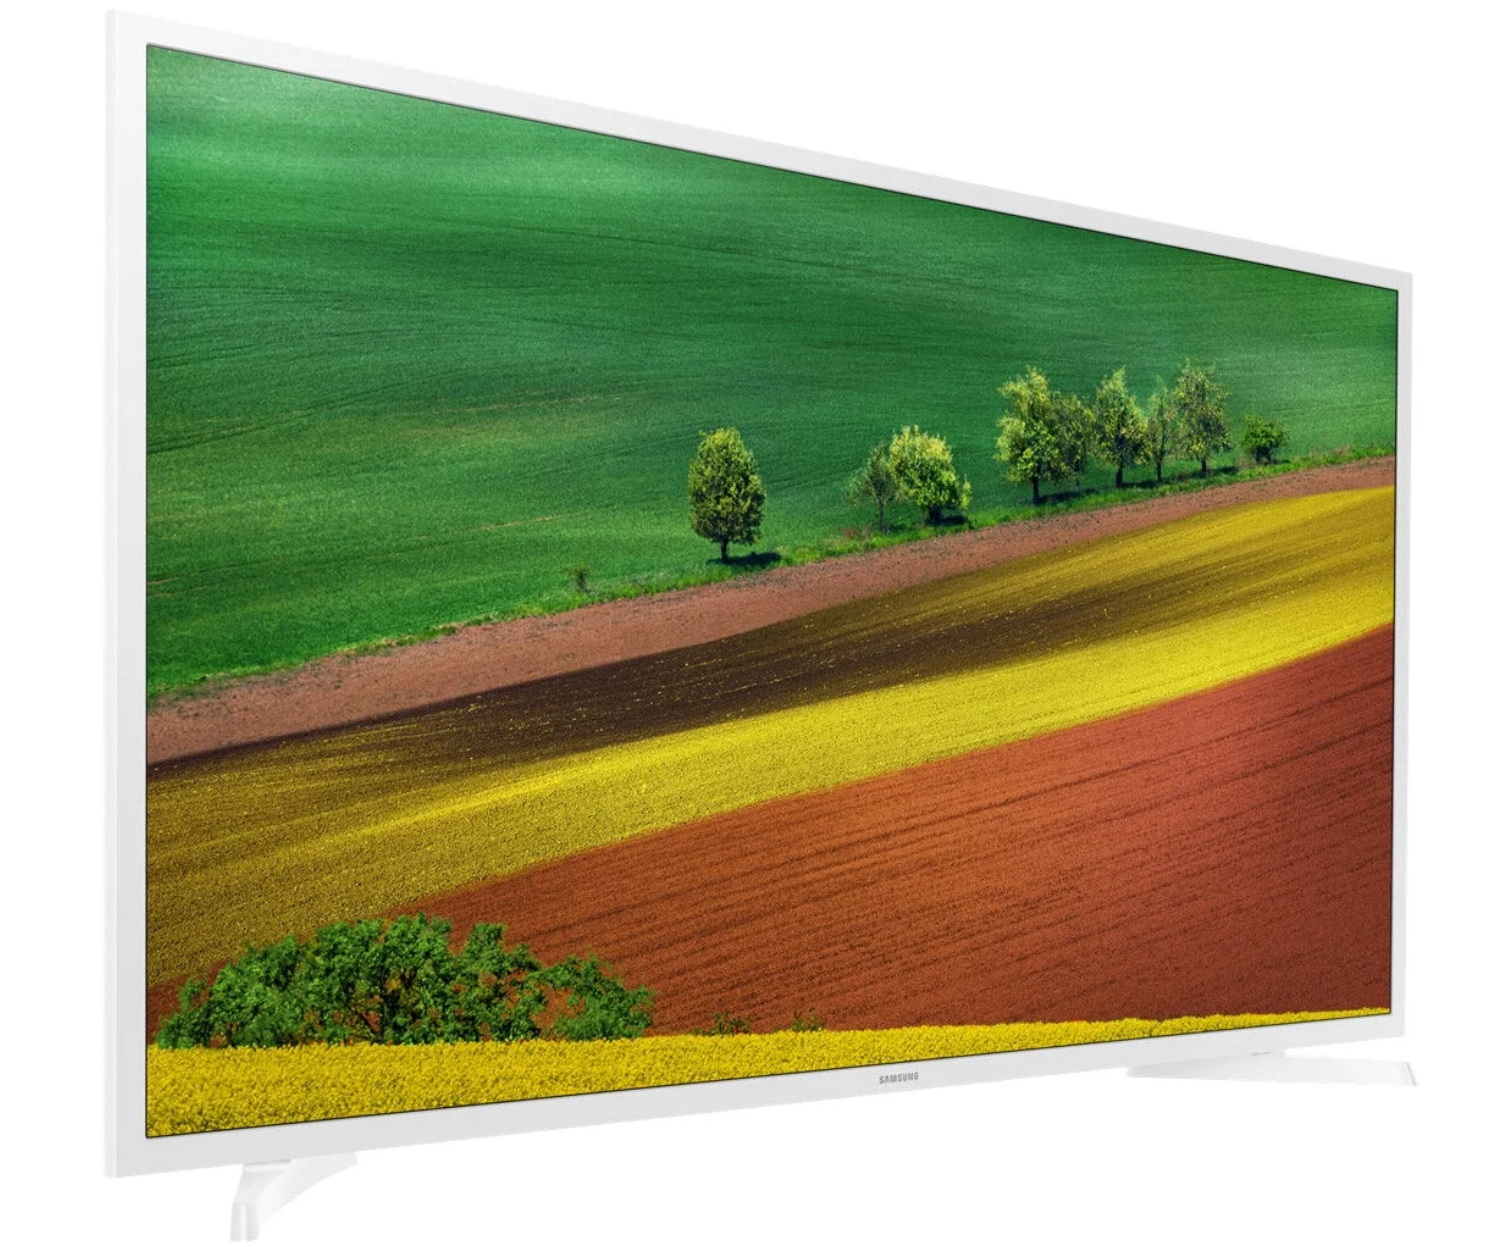 Телевизор Samsung UE32N4010AU 32″ (2018), белый